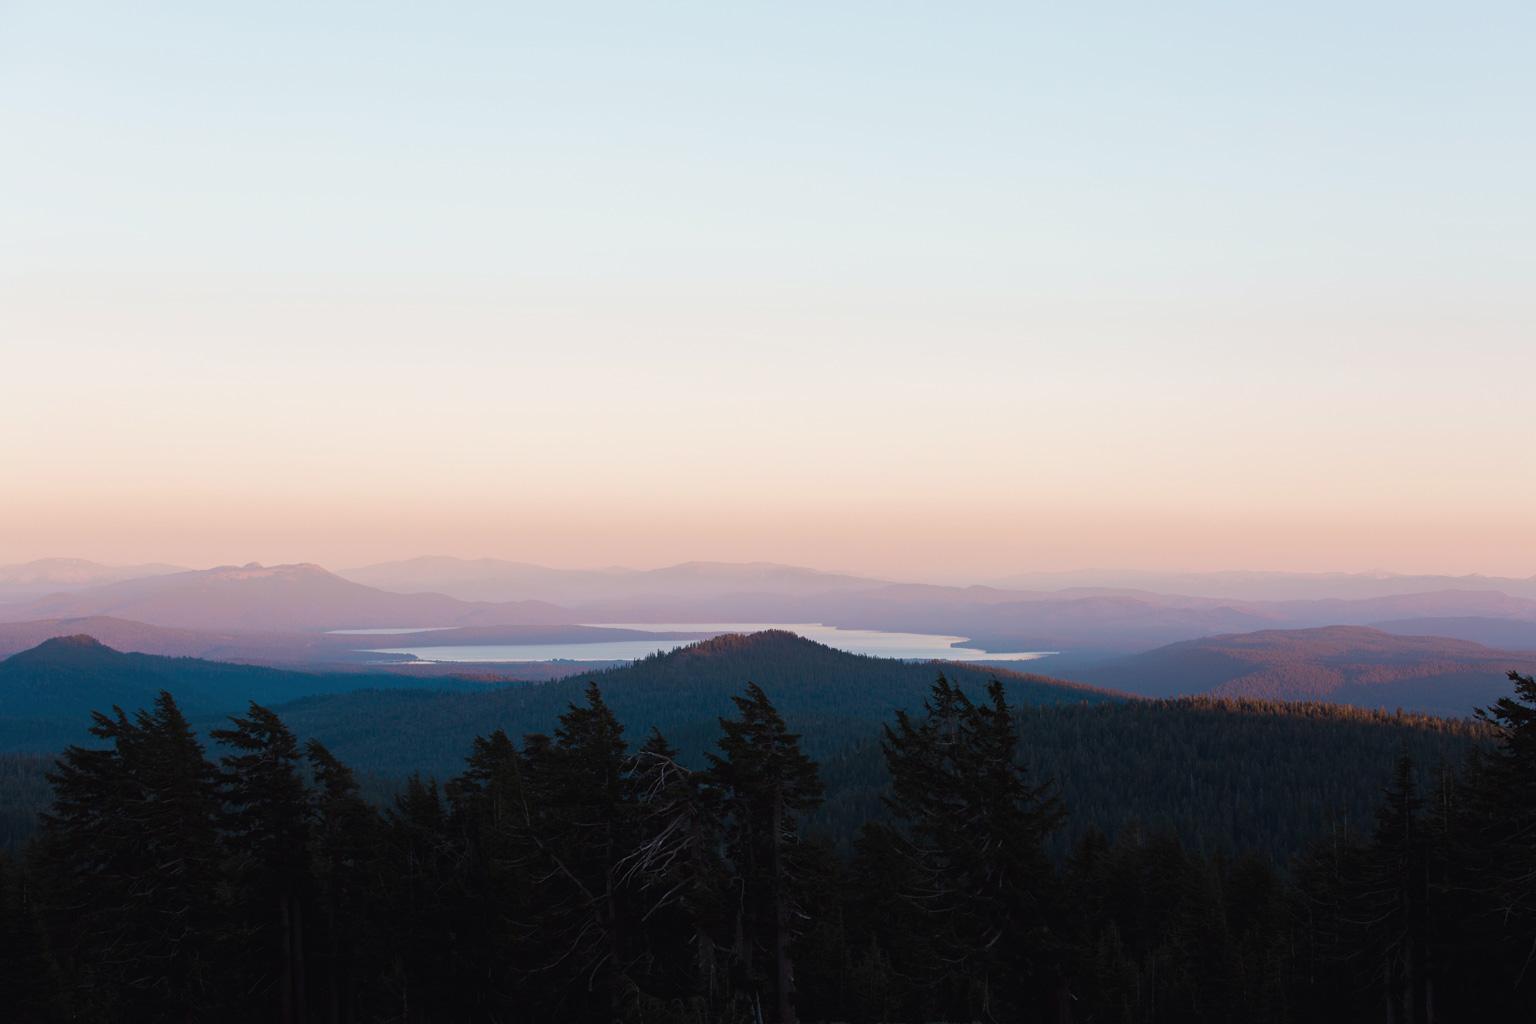 CindyGiovagnoli_Lassen_Volcanic_National_Park_California_camp_road_trip-024.jpg